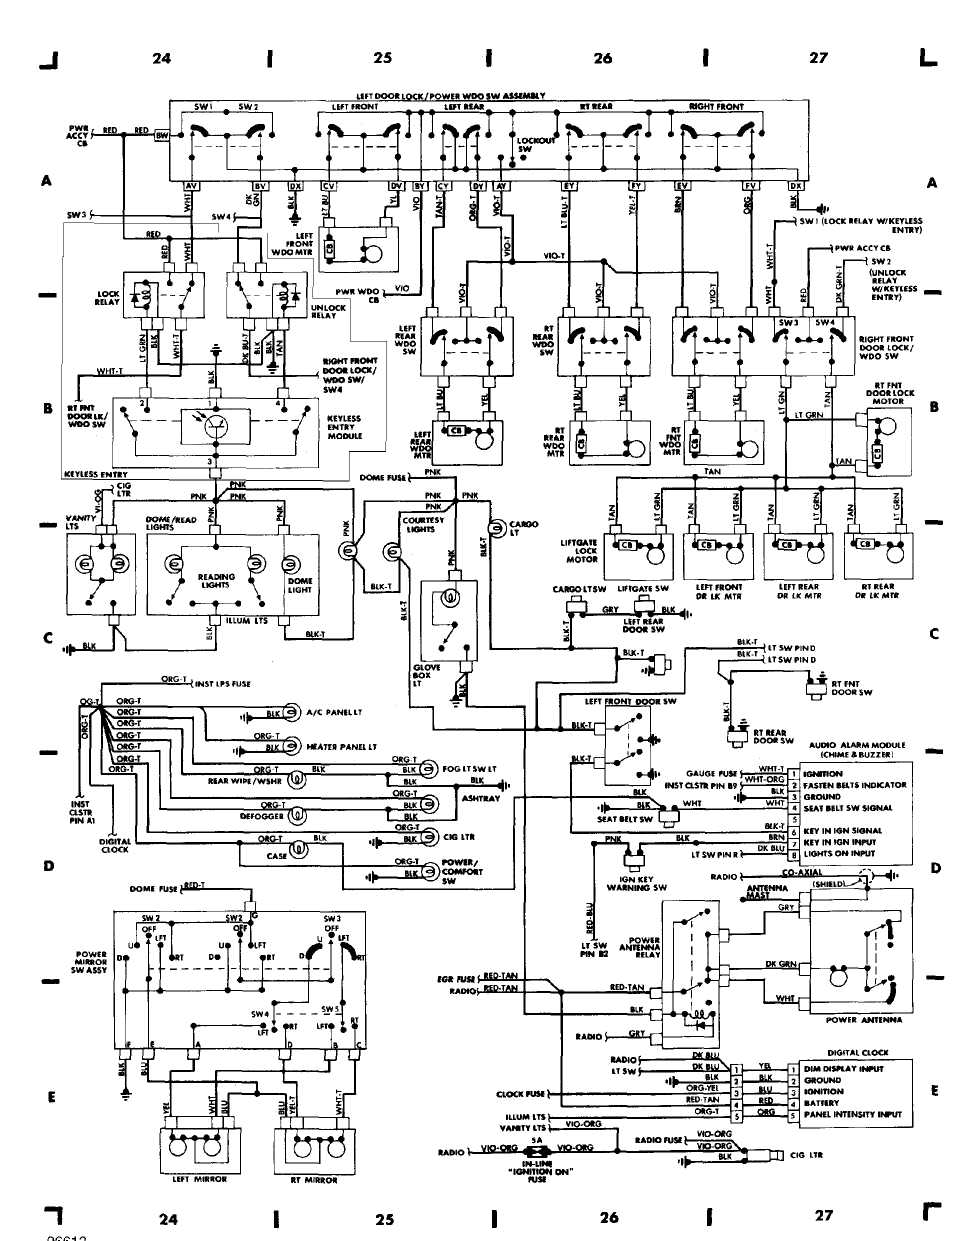 Brilliant 1989 Jeep Transfer Case Diagram Wiring Schematic Wiring Library Wiring Cloud Lukepaidewilluminateatxorg